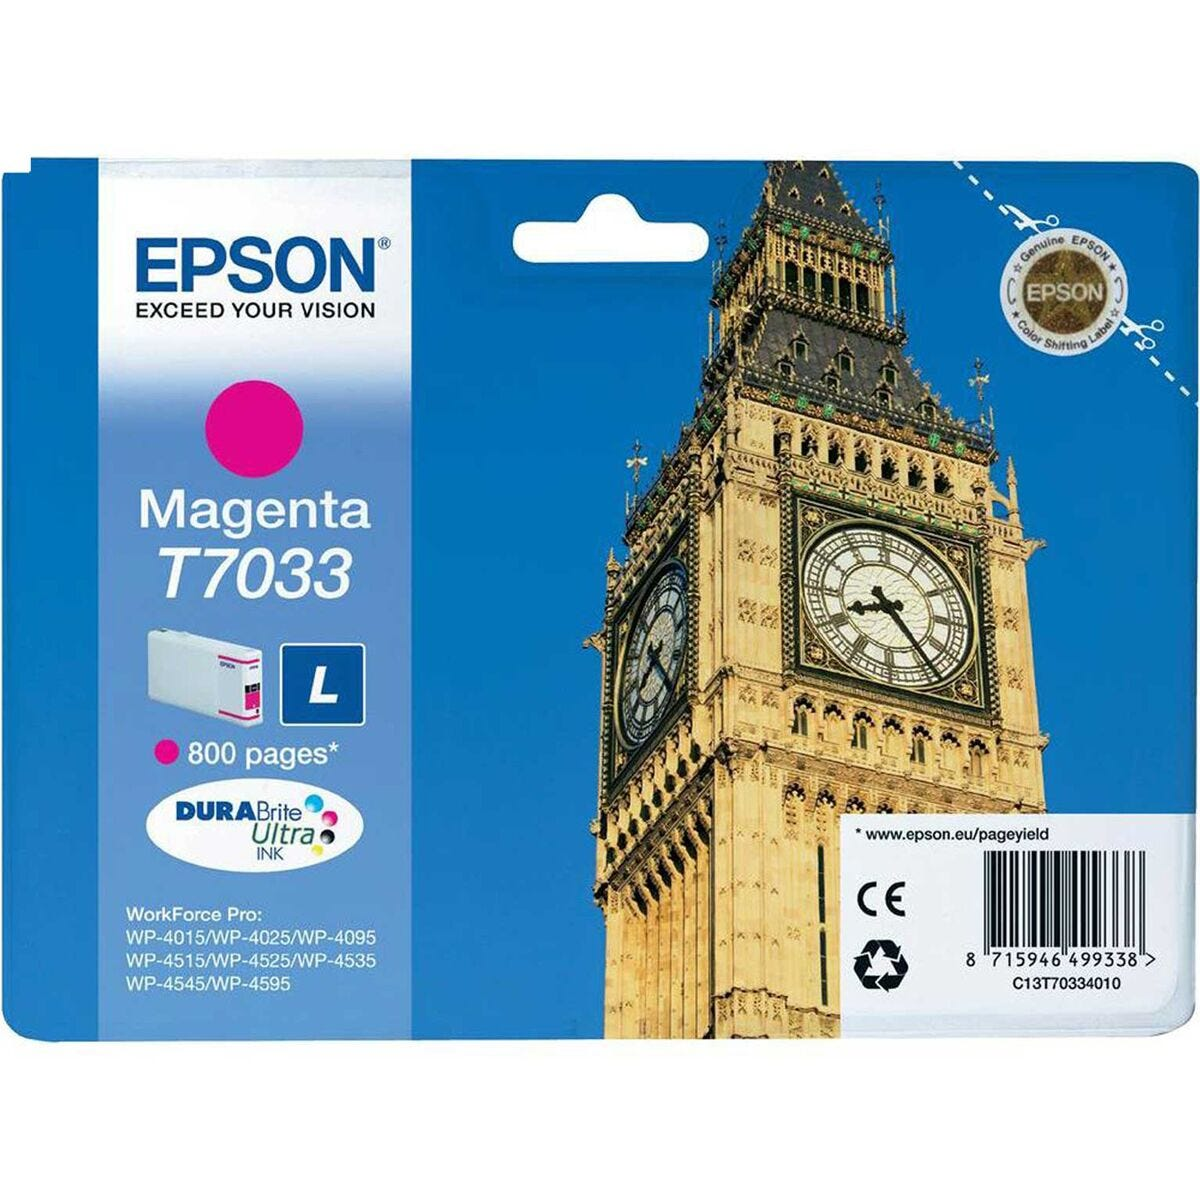 Epson T7033 Ink Cartridge